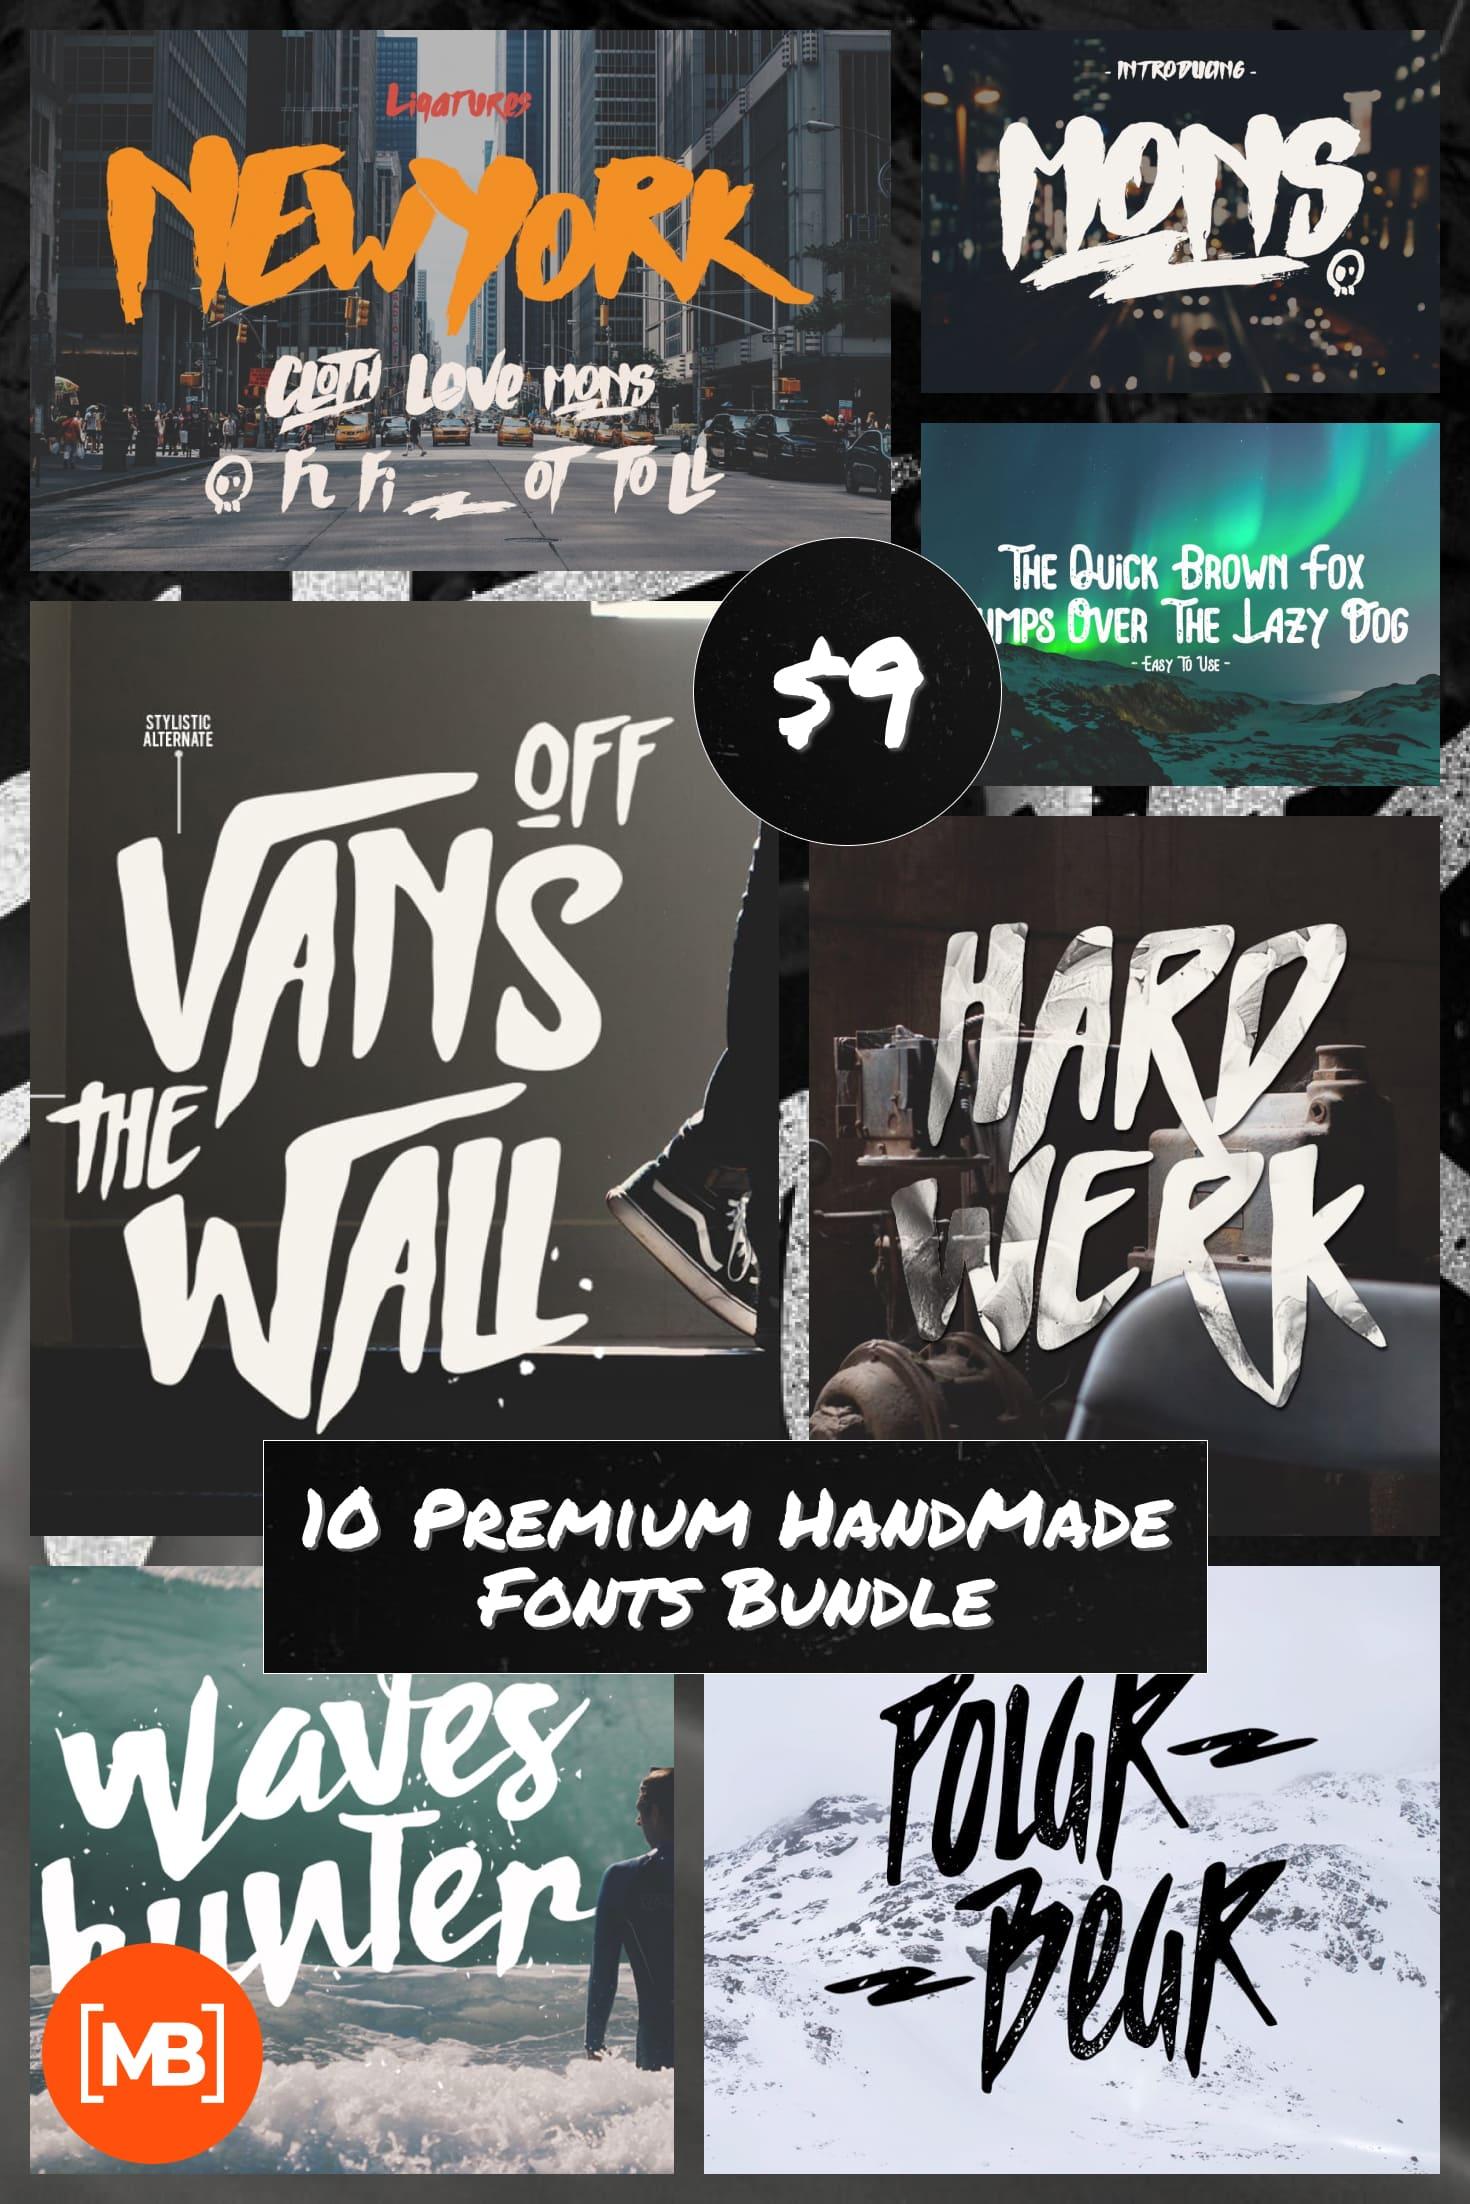 10 Premium HandMade Fonts Bundle - just $9. Collage Image.